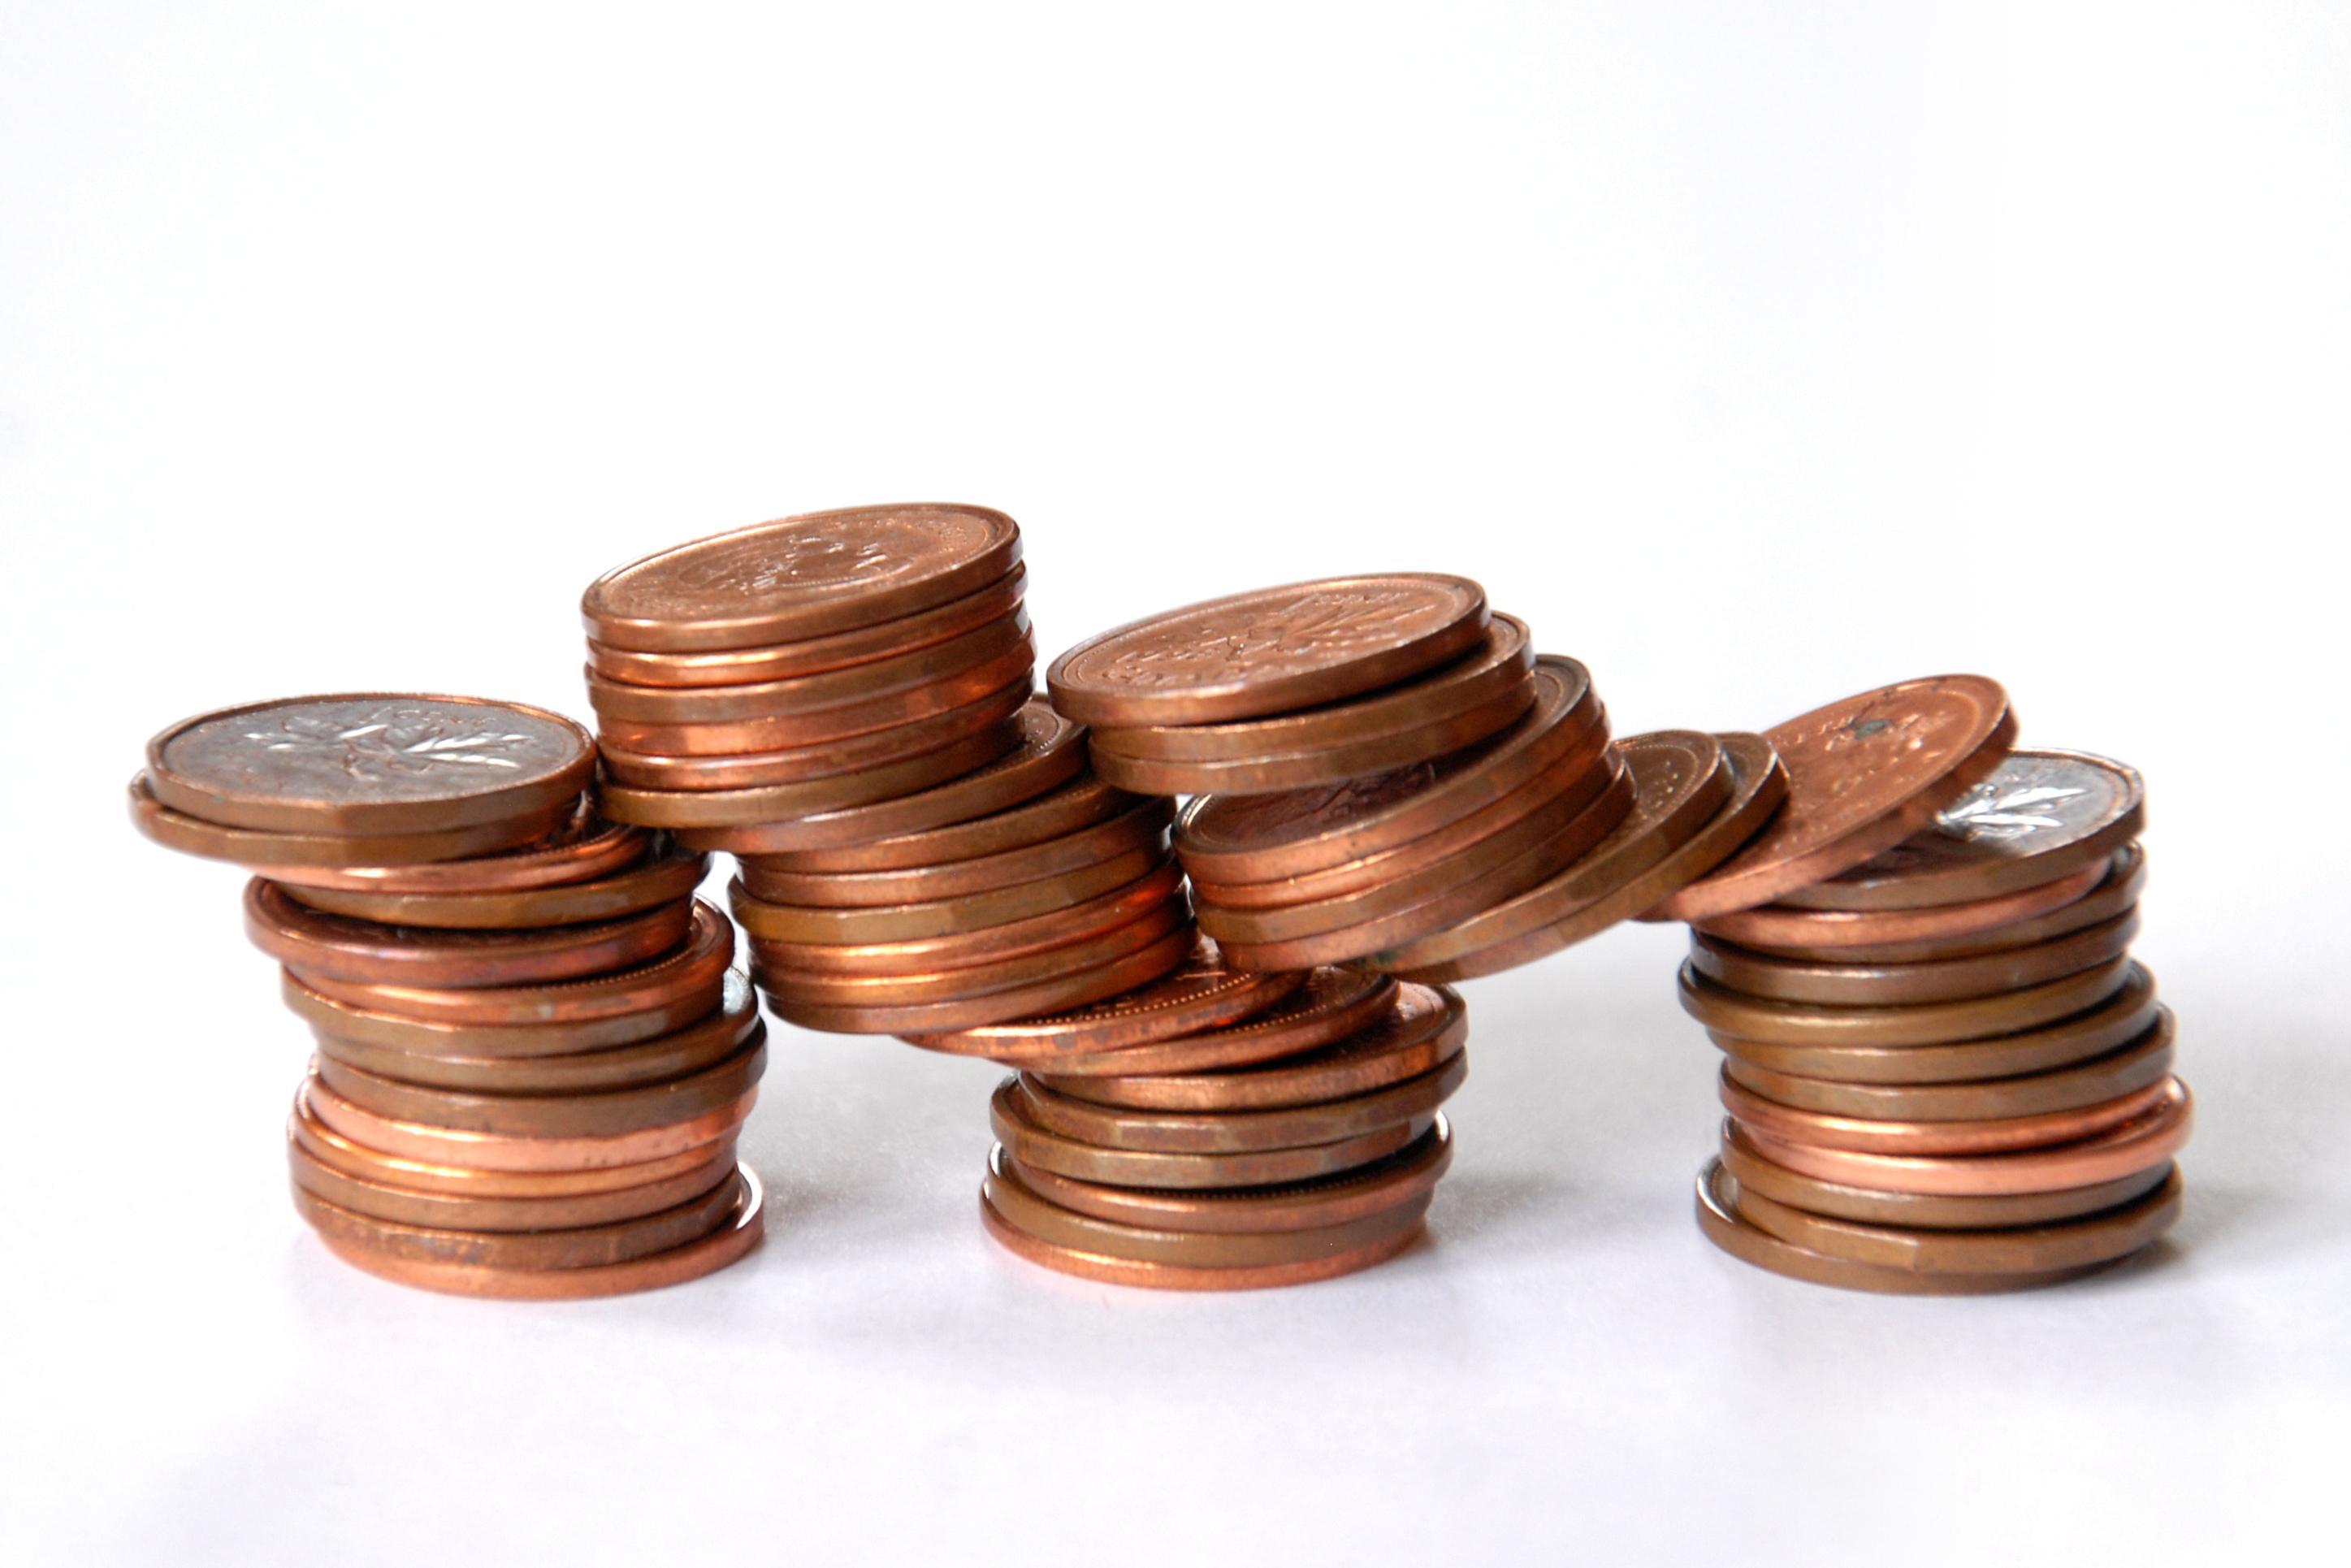 Best 5 online payday loan lenders in Canada